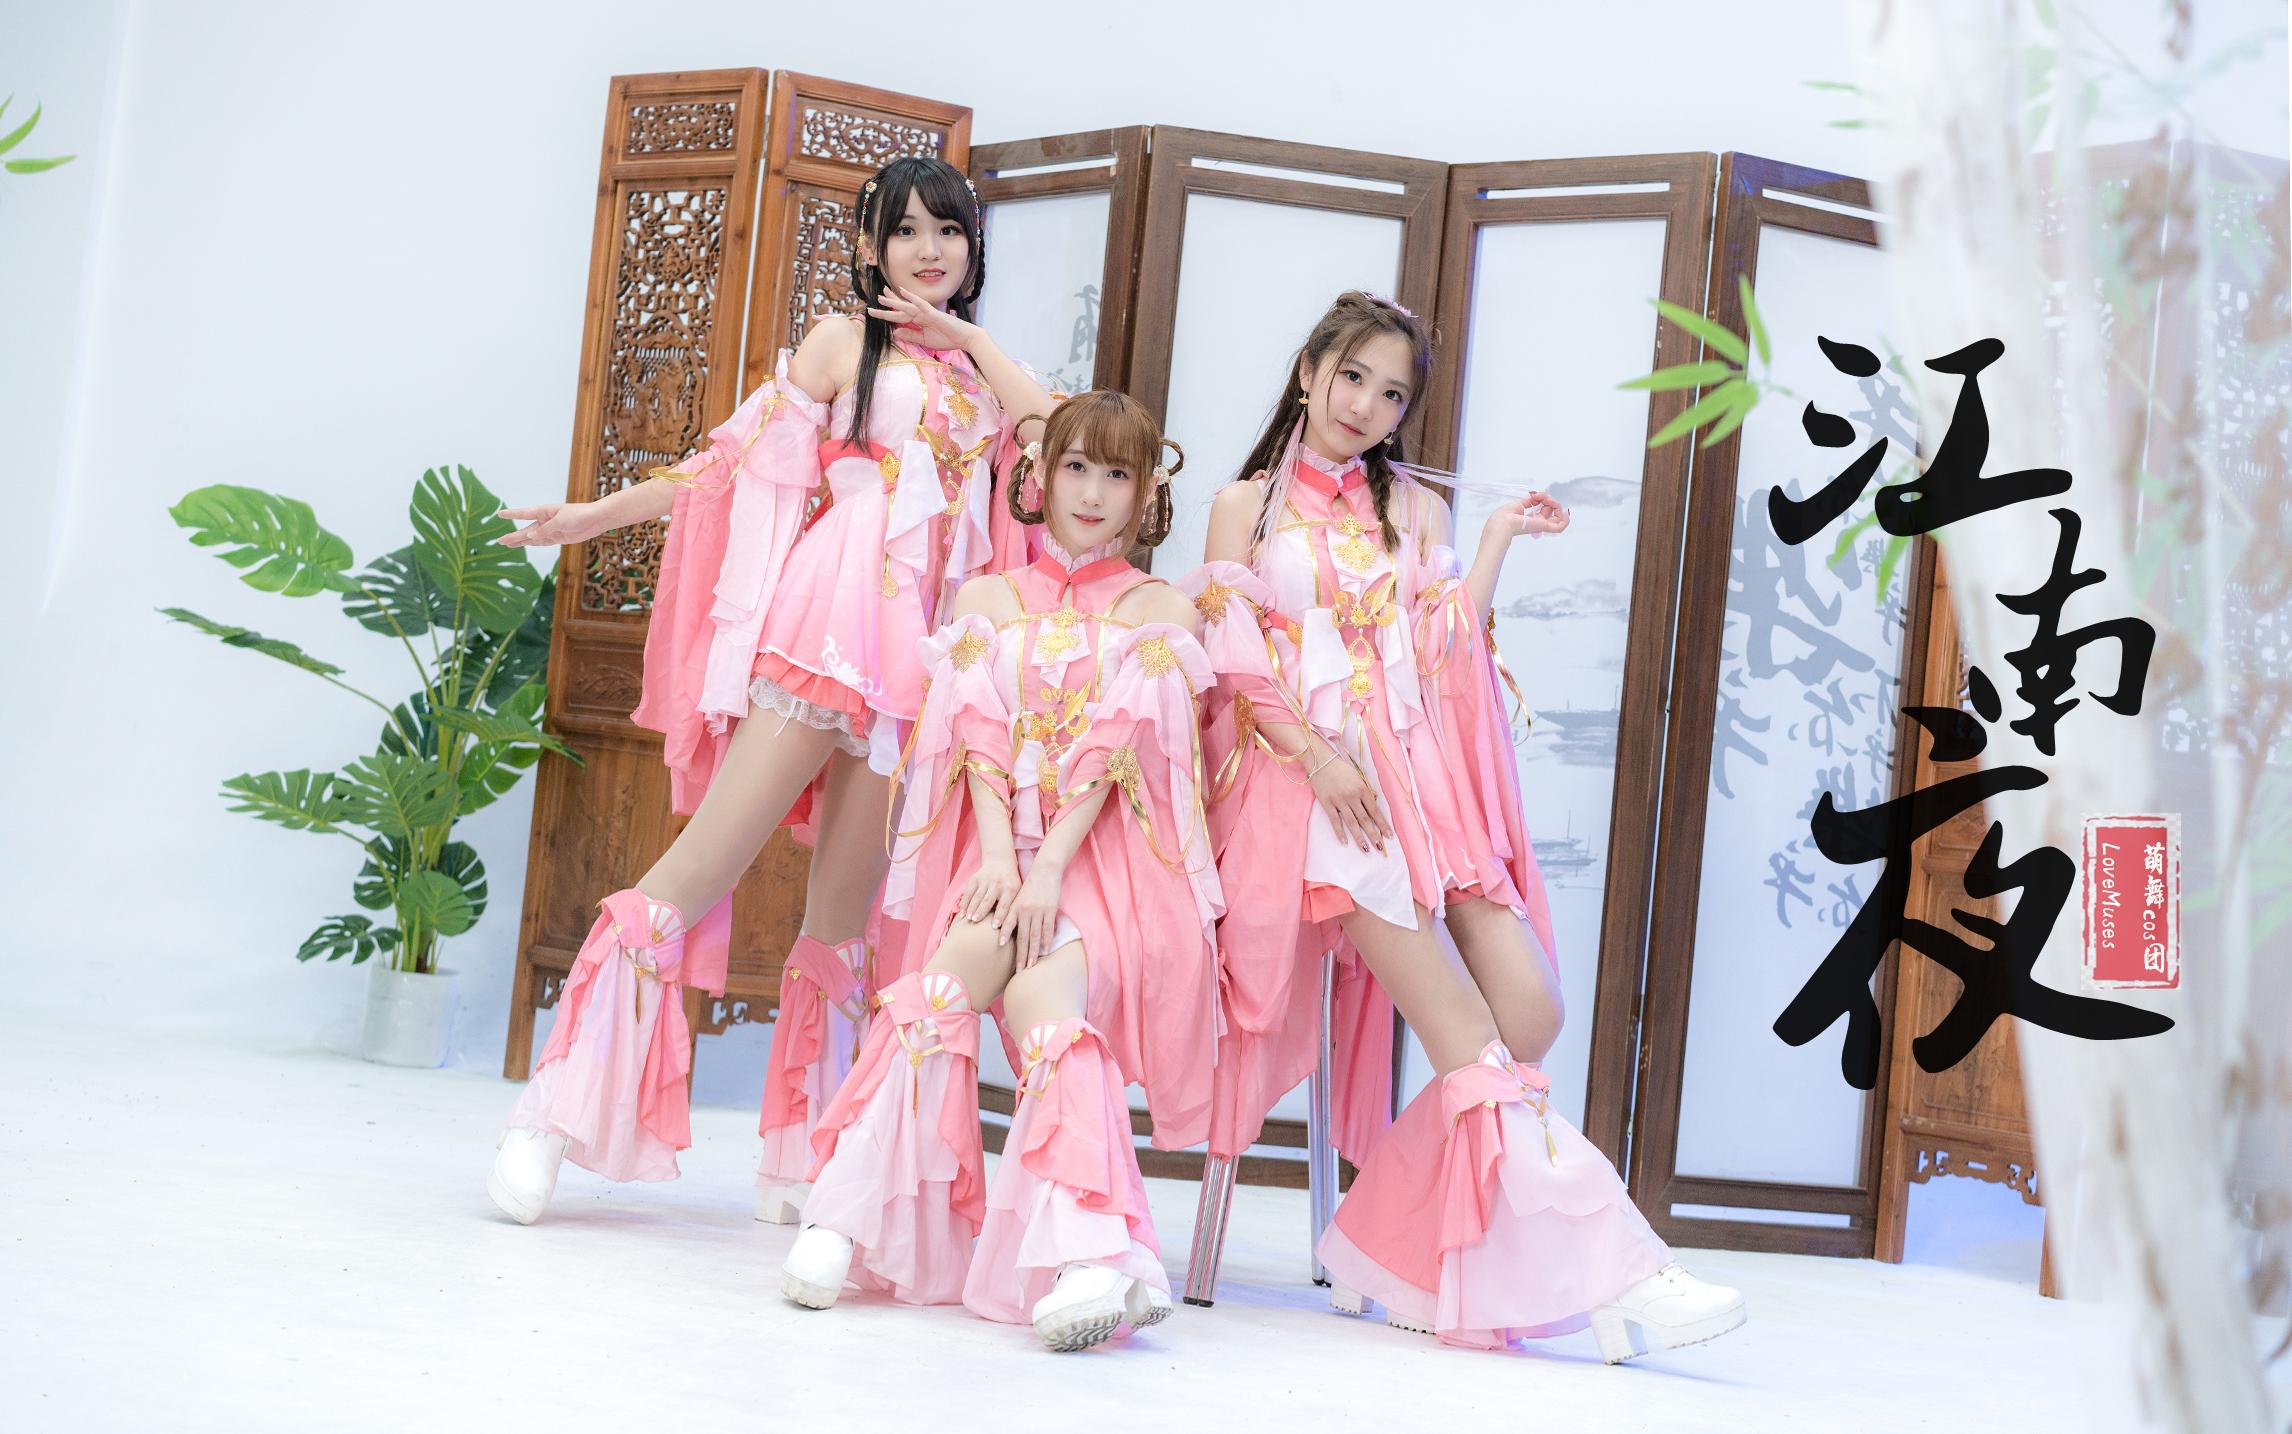 【LoveMuses团】国风七秀配七朵✿江南夜✿哪个秀萝是你的情缘缘